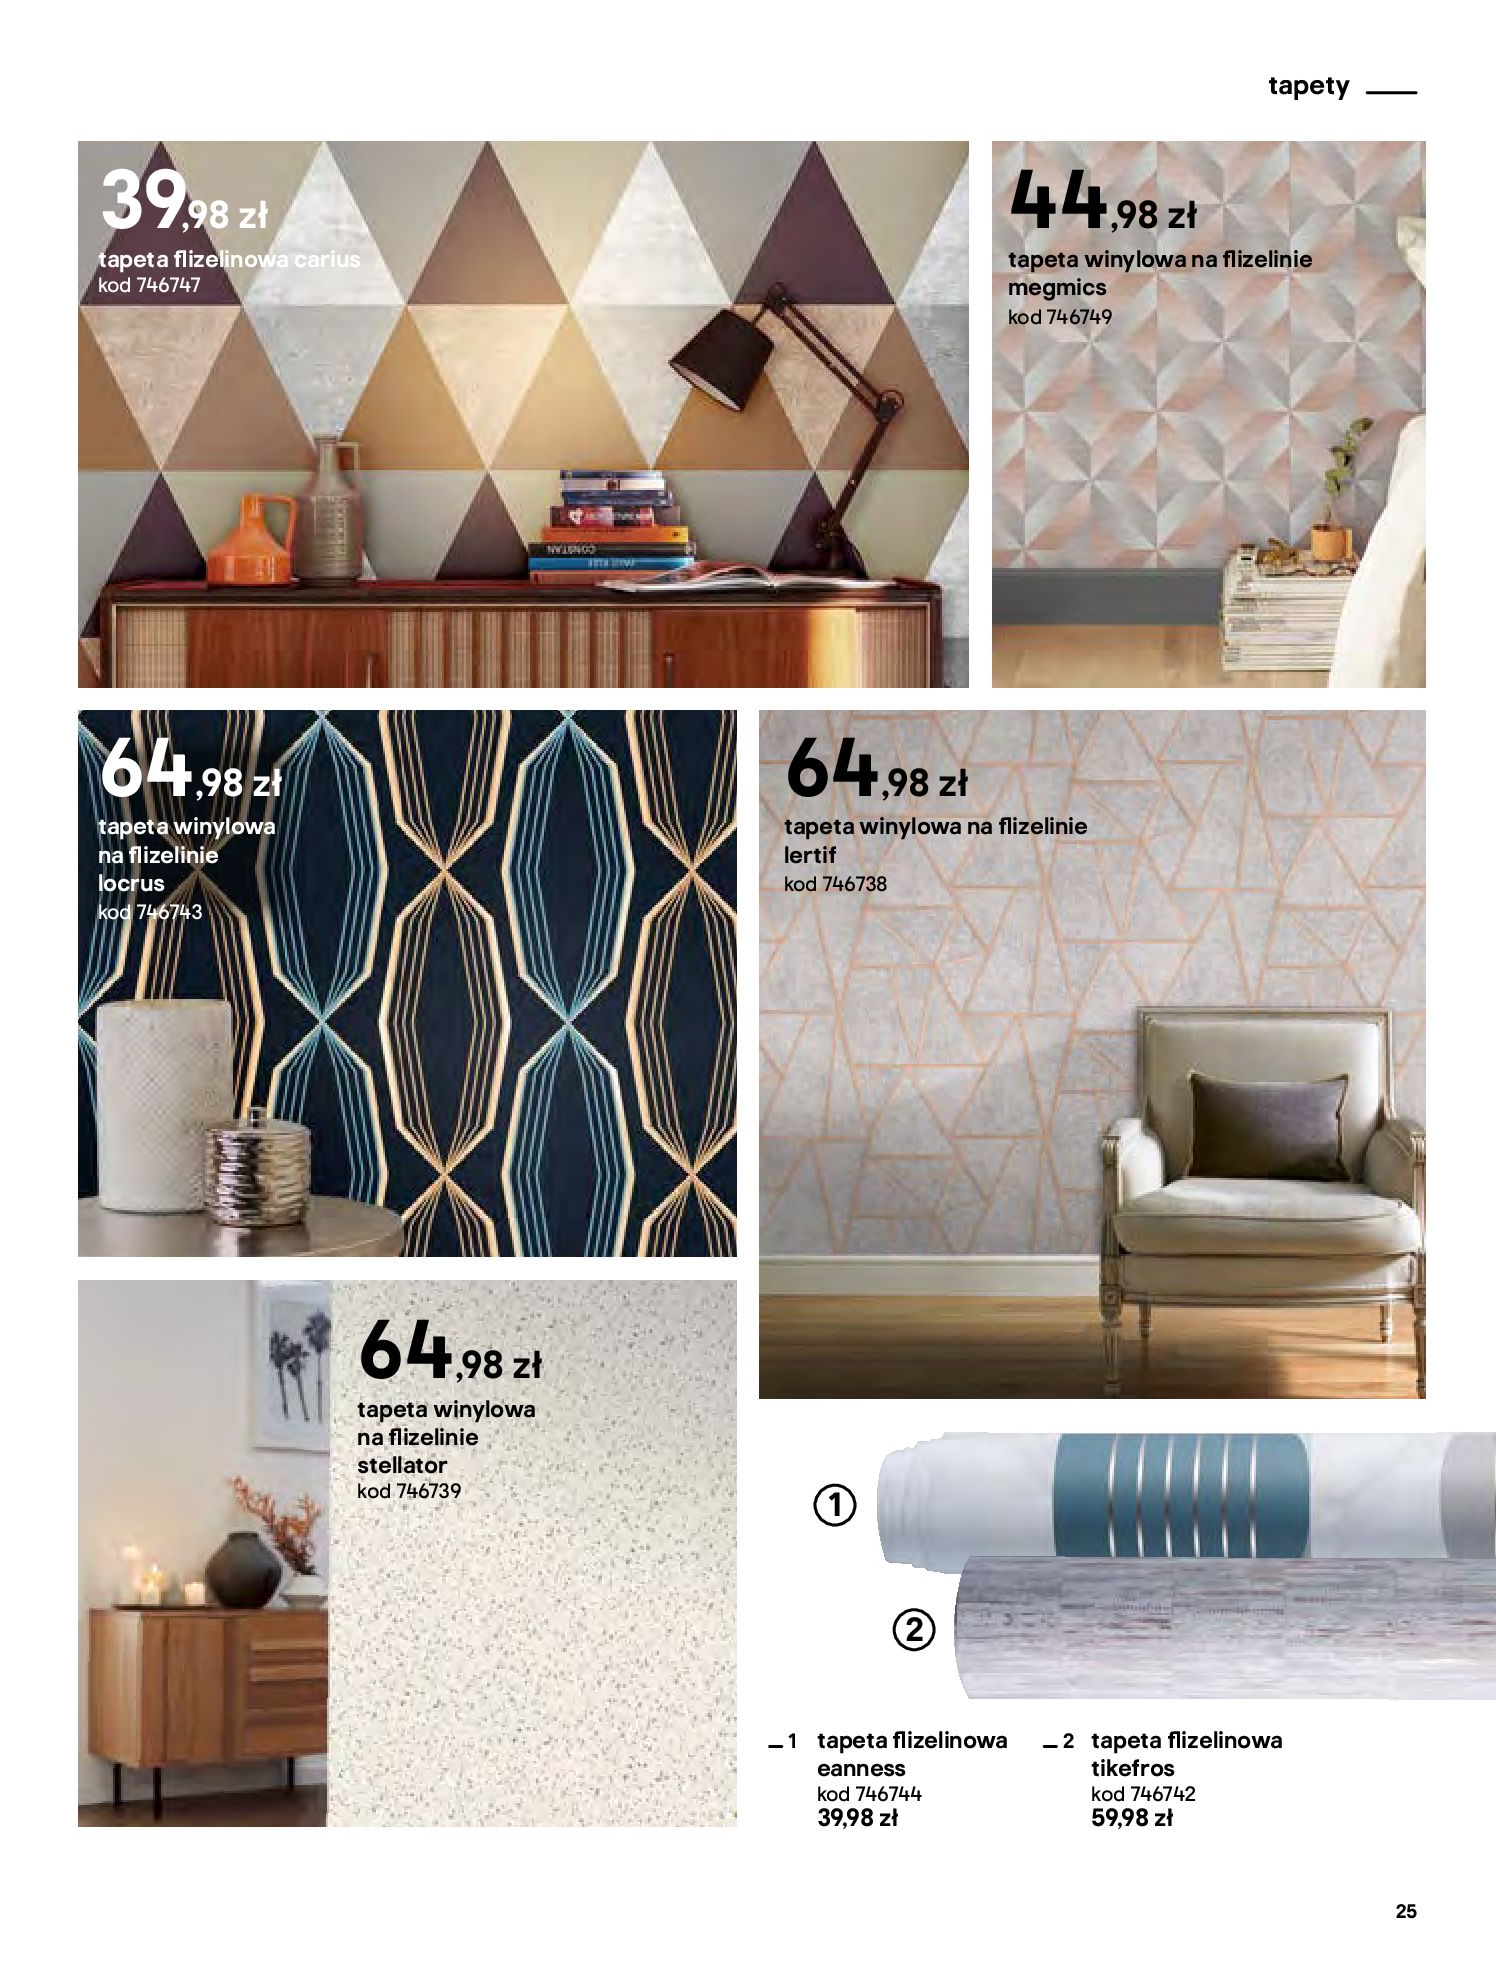 Gazetka Castorama - Katalog Dekoracje-22.10.2020-31.12.2020-page-25